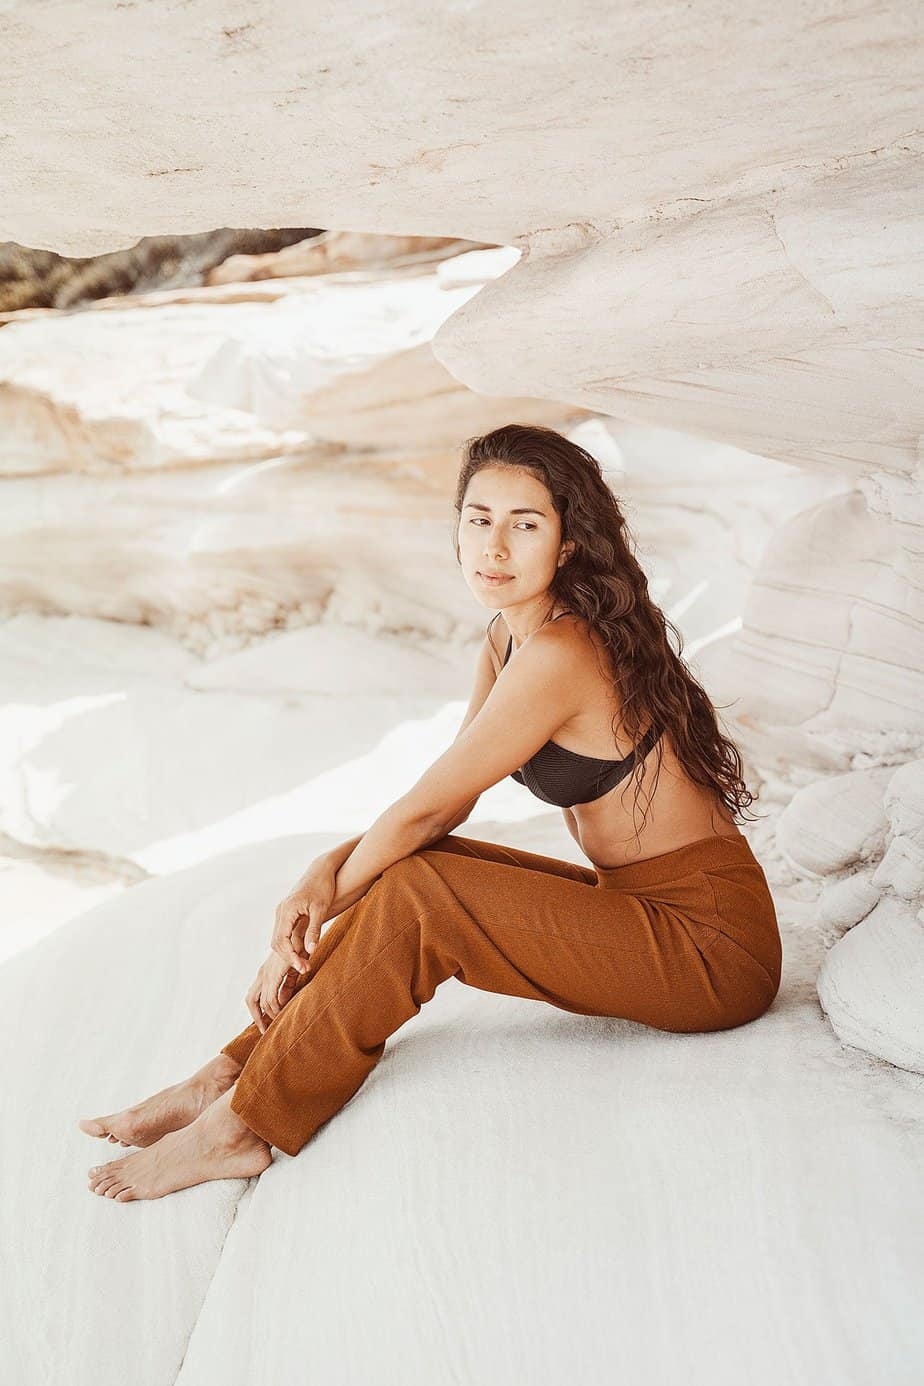 FrancescaBandiera_Catalina_RoyalNationalPark_portrait_shot_DSC07705